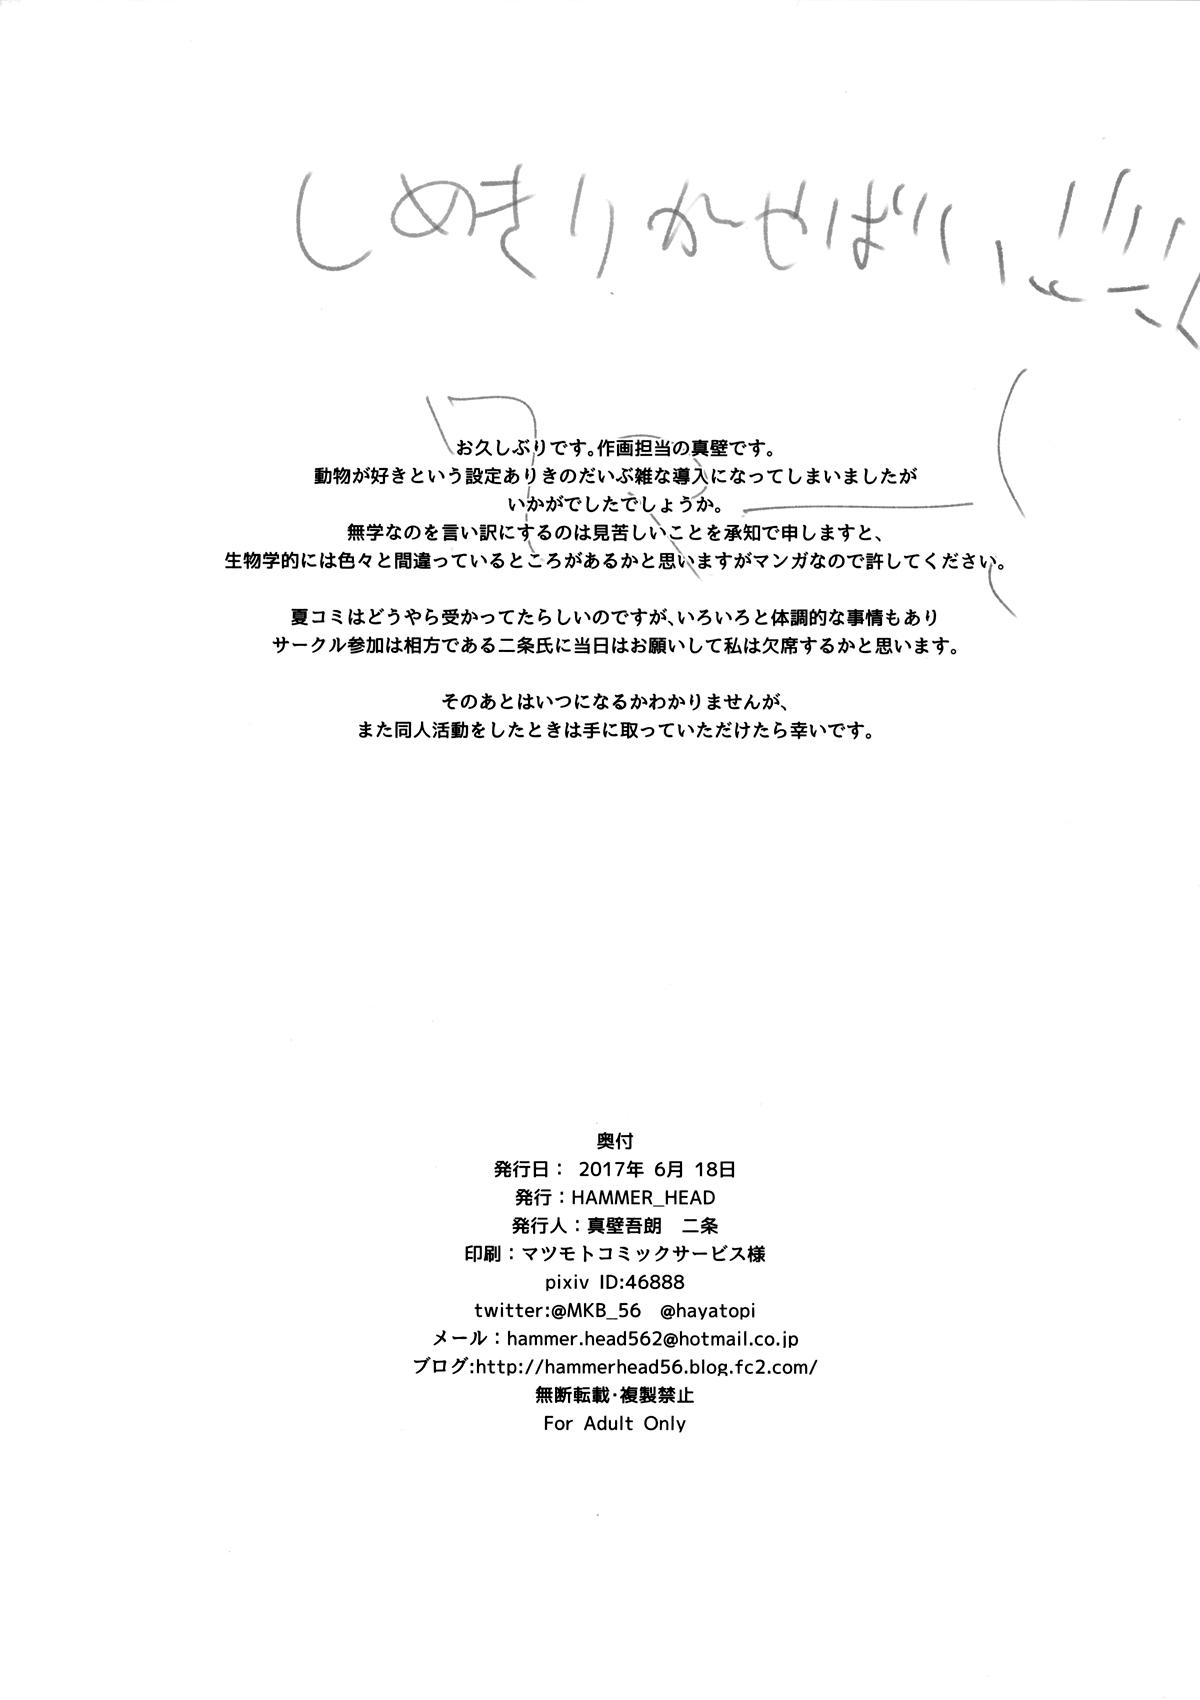 HentaiVN.net - Ảnh 25 - Matoba Risa-chan de Manabu Doubutsu no Koubi - 的場梨沙ちゃんで学ぶ動物の交尾 - Oneshot